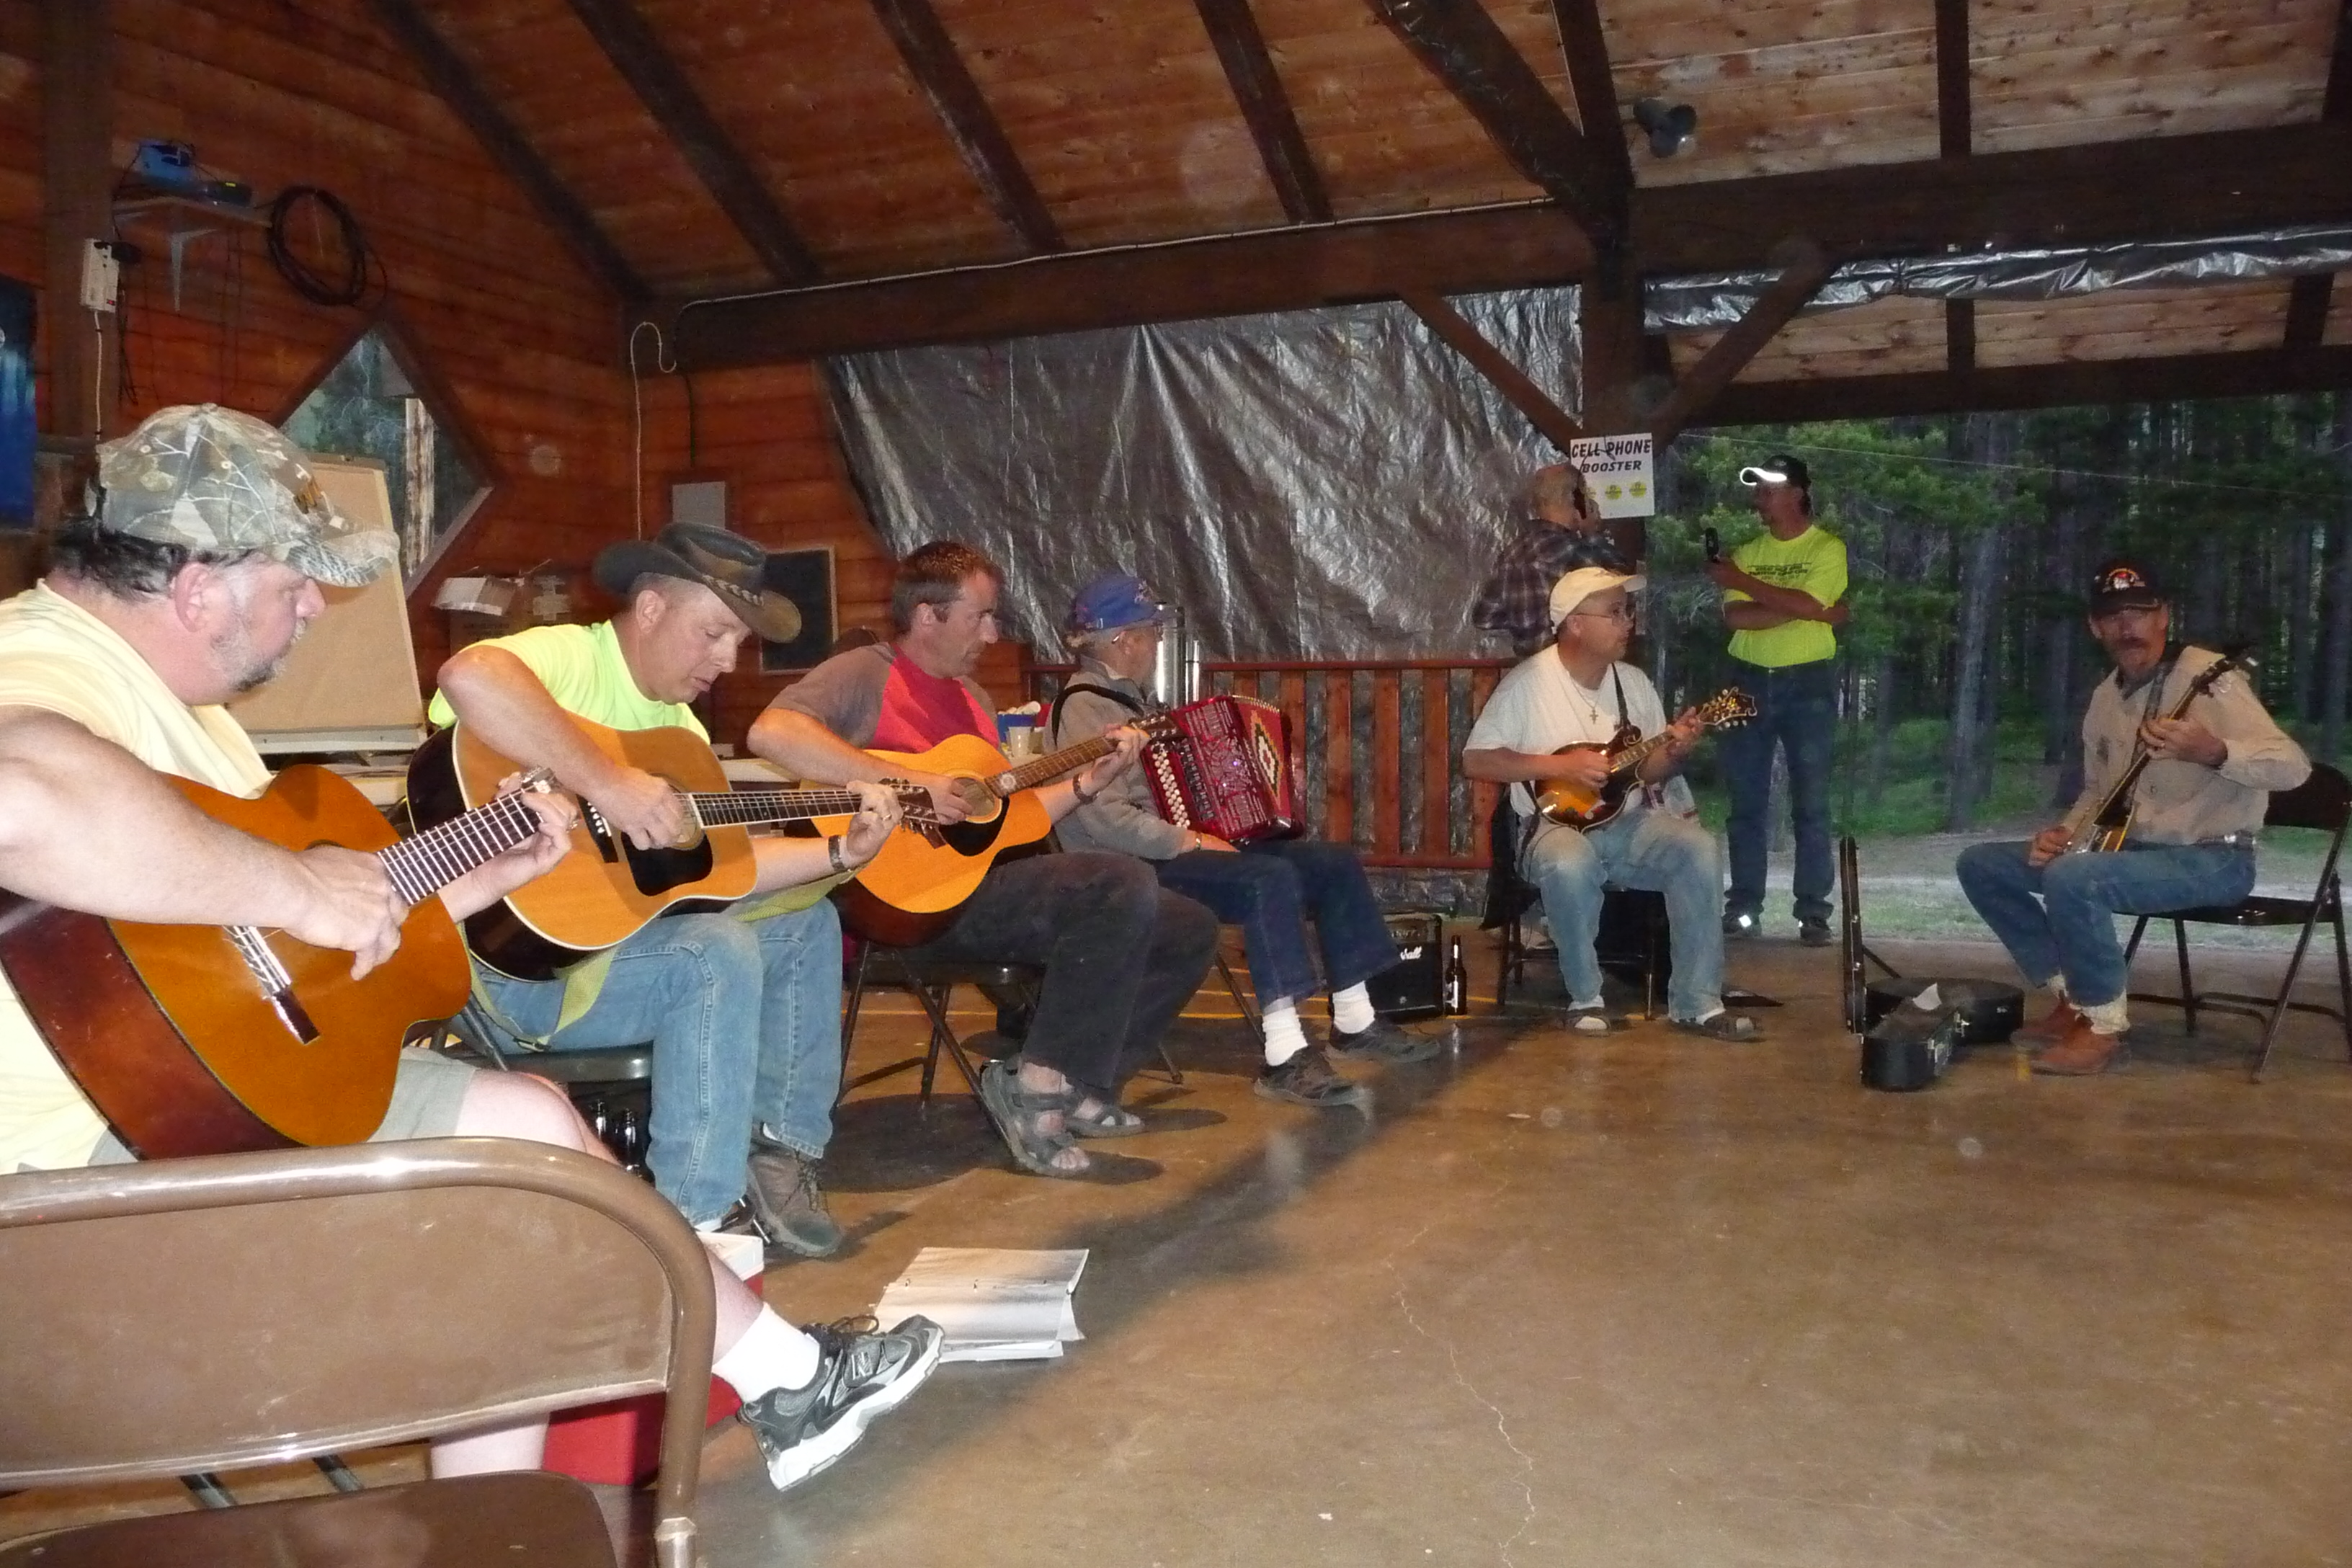 2010 GW Hamfest Music on Saturday night